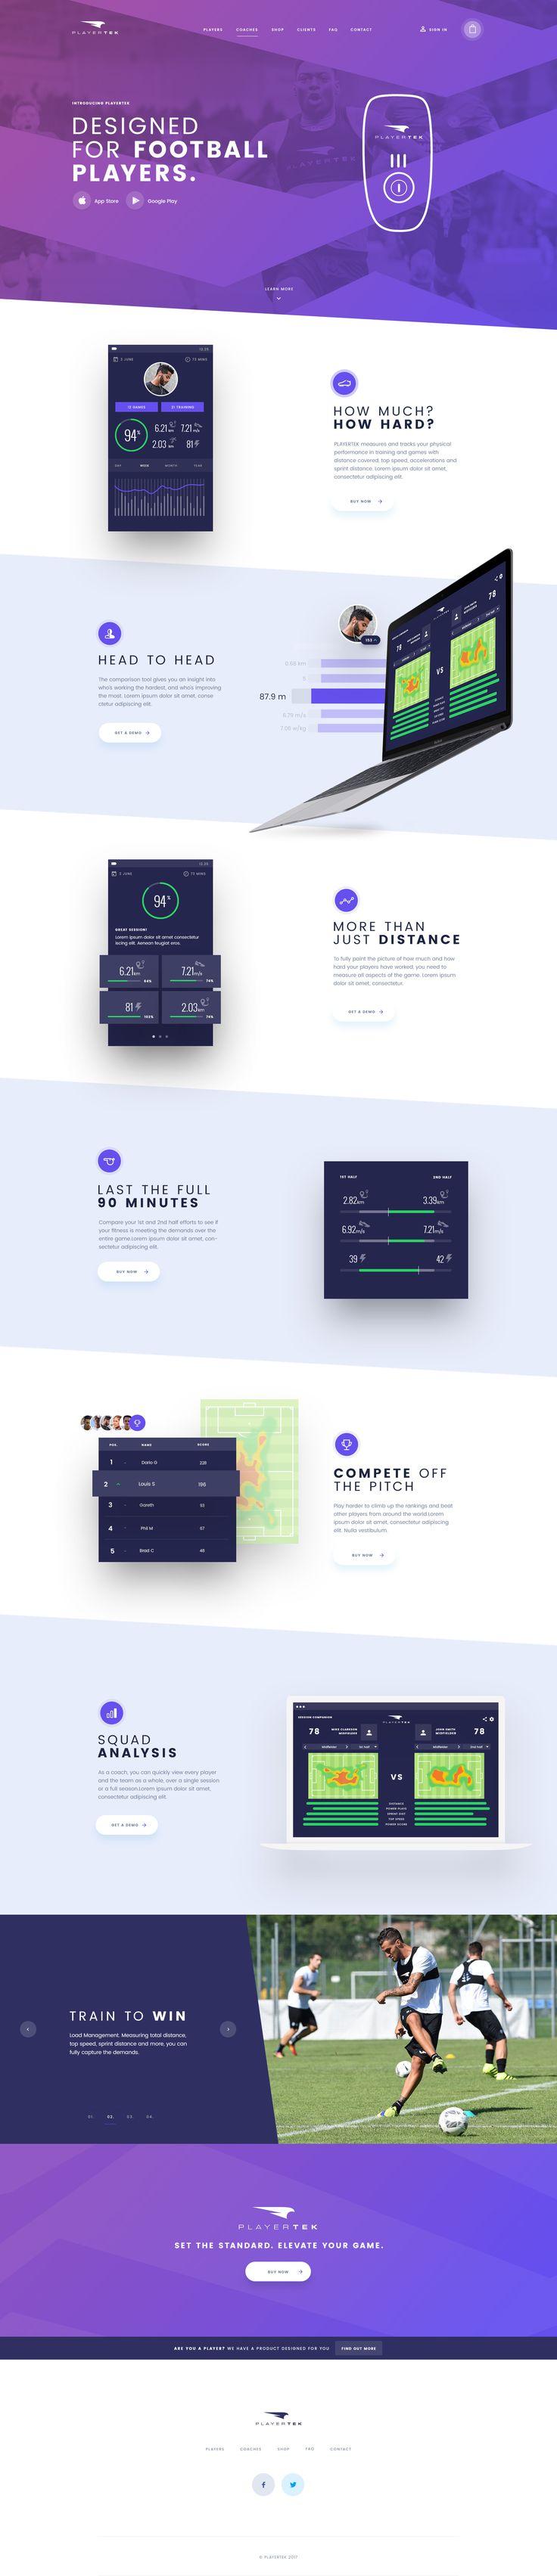 mobile website design templates